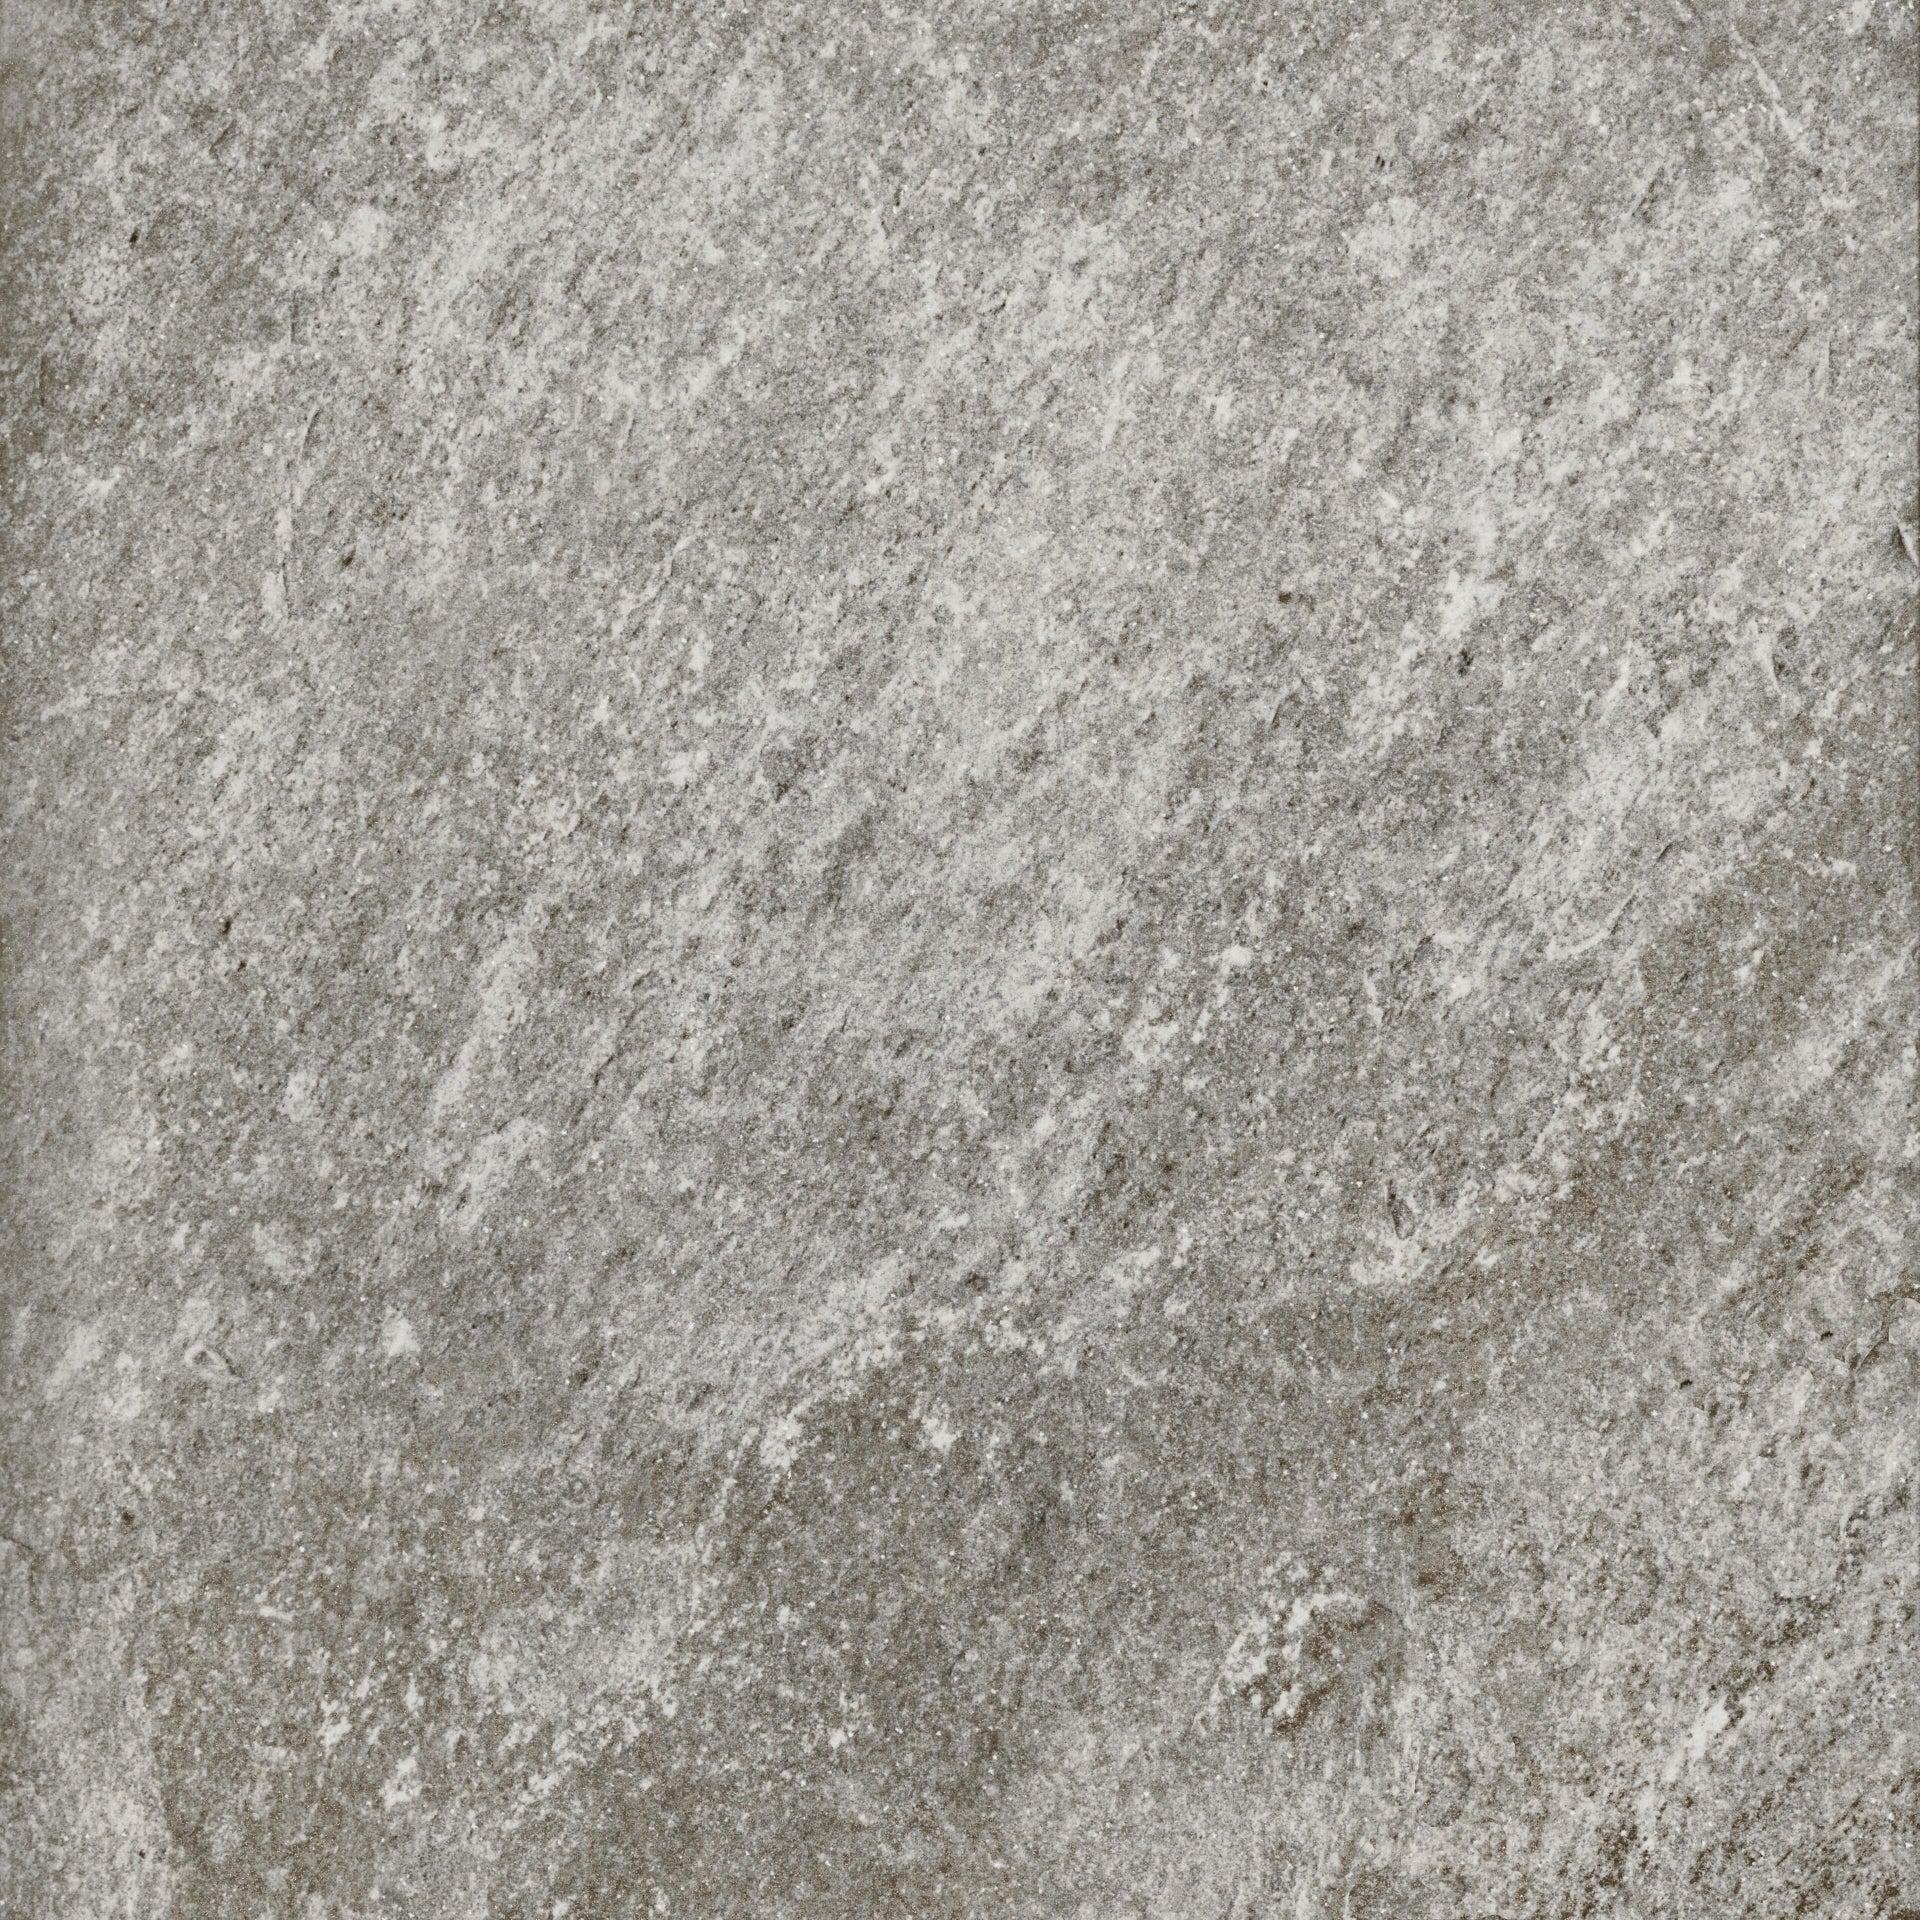 Piastrella da pavimento Walk 32.5 x 32.5 cm sp. 9 mm PEI 3/5 grigio - 6